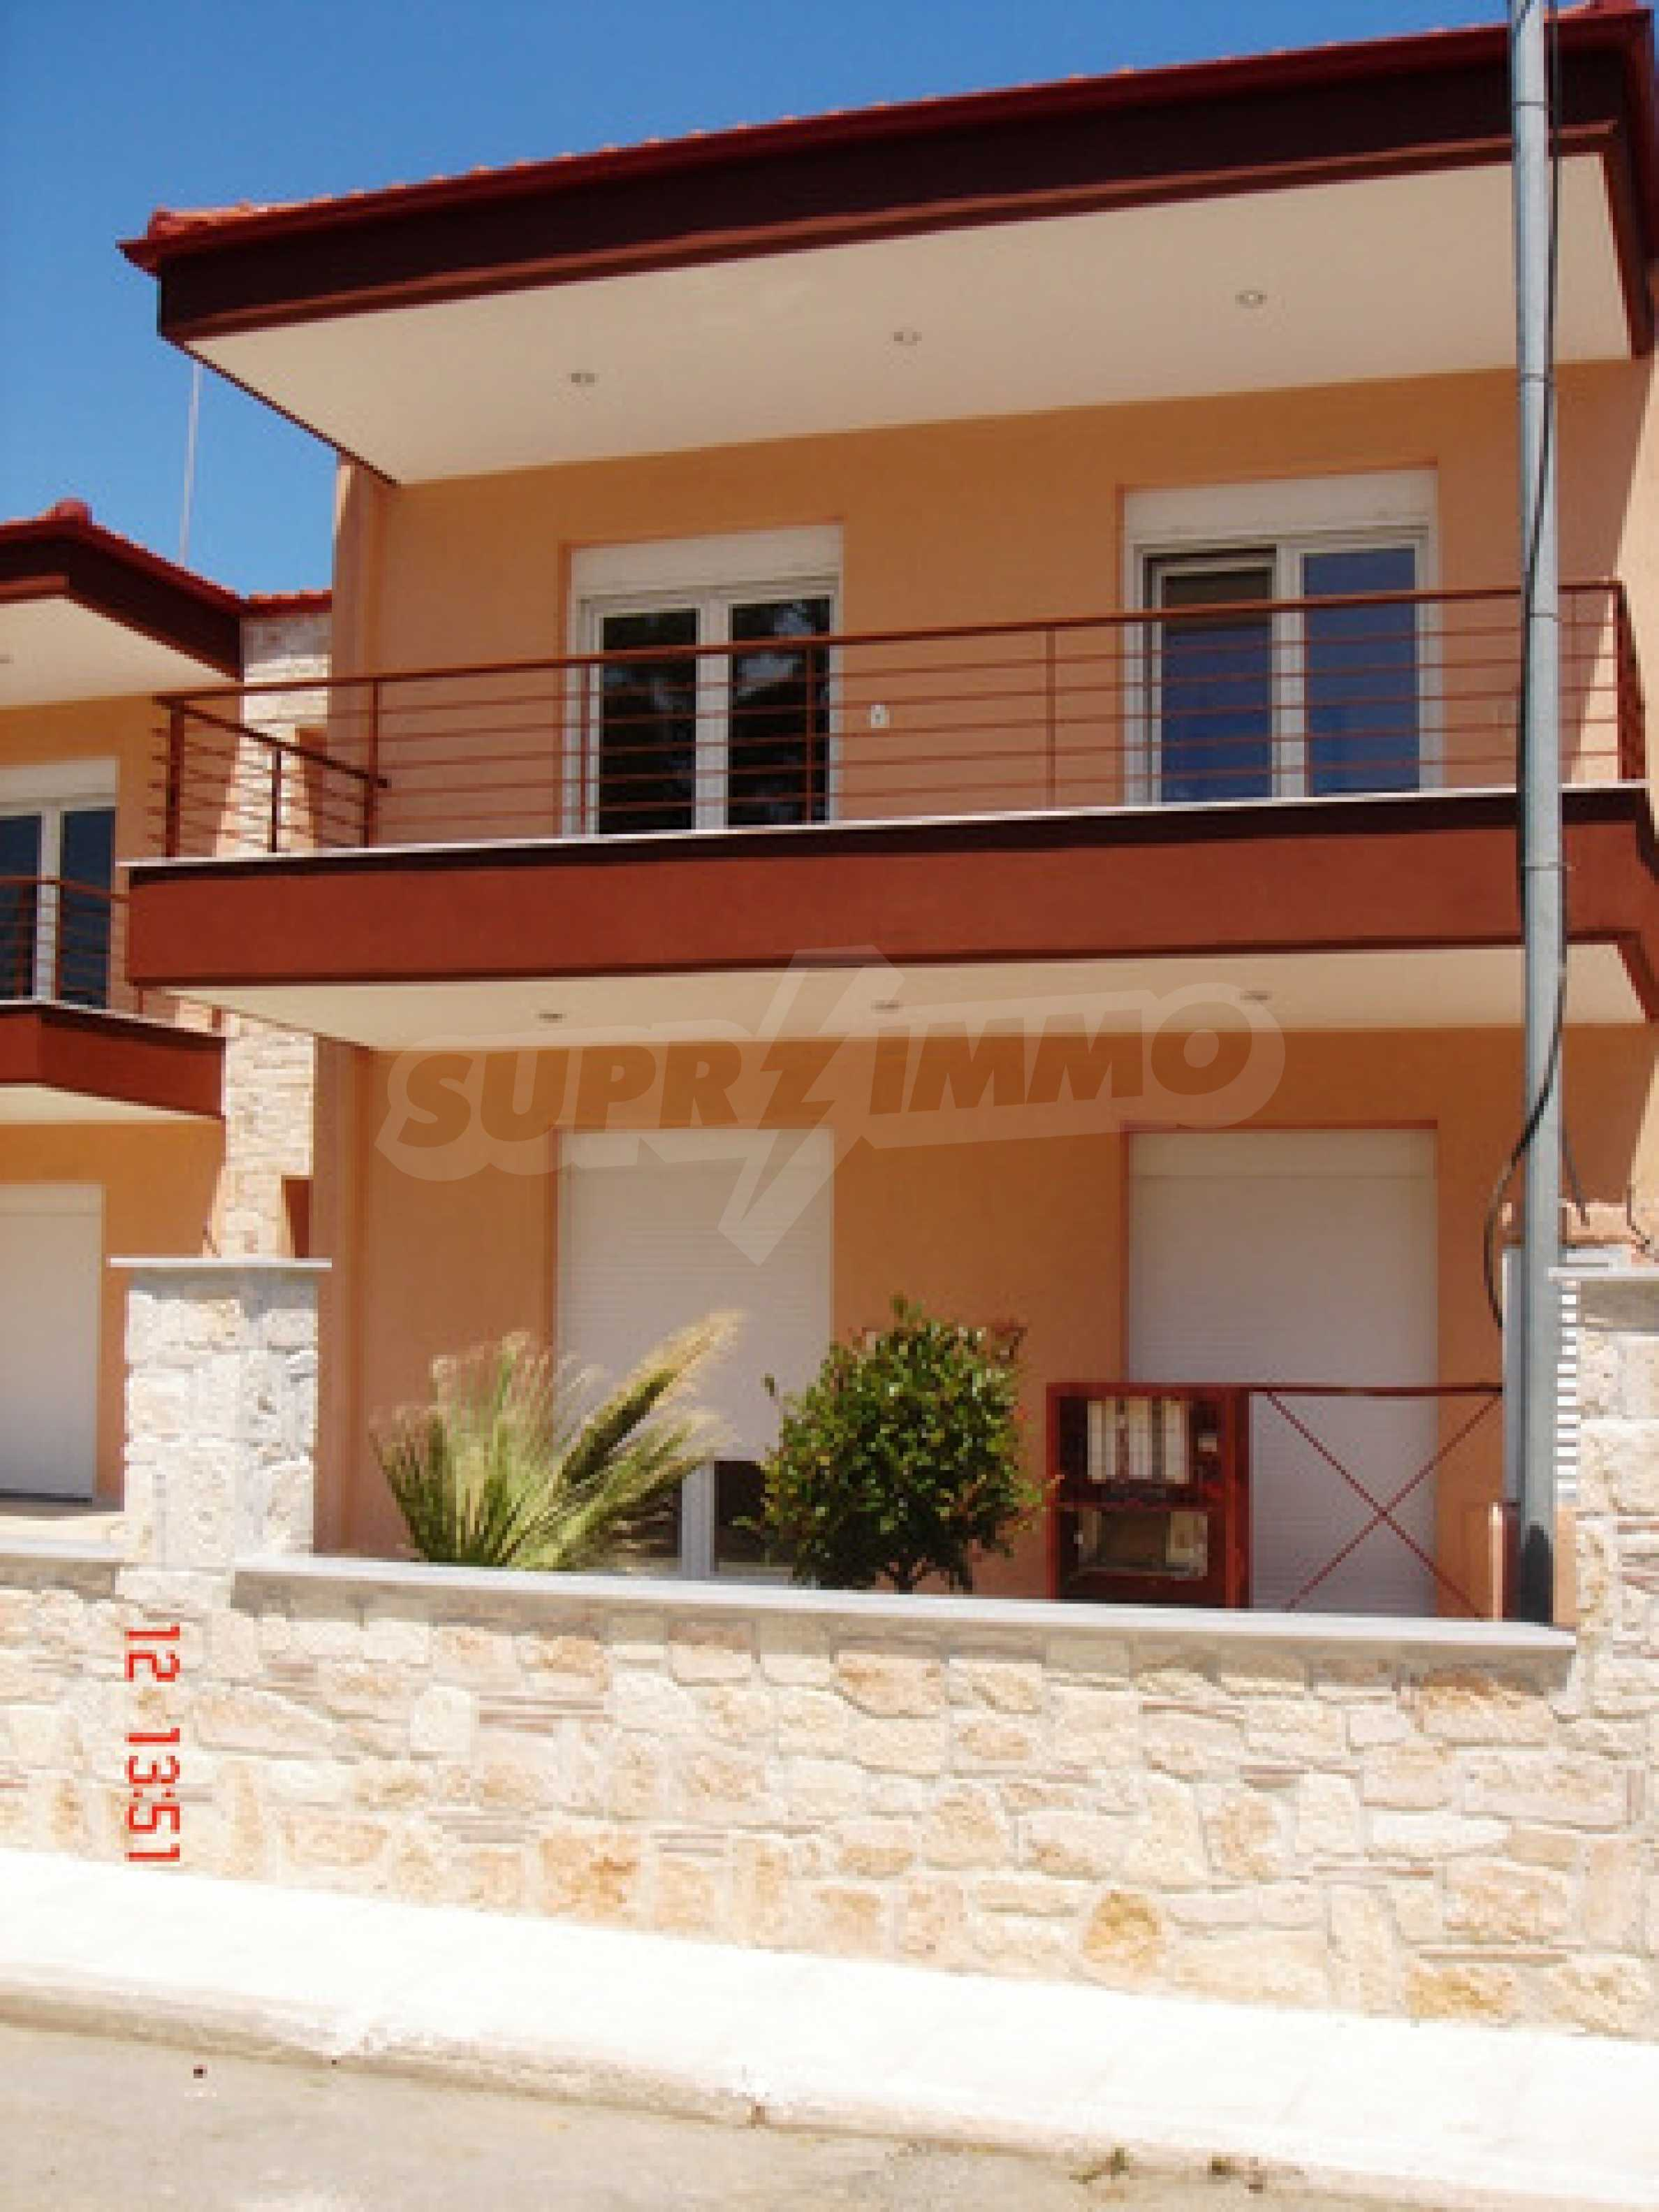 тристаен апартамент в Потидея, Касандра 4